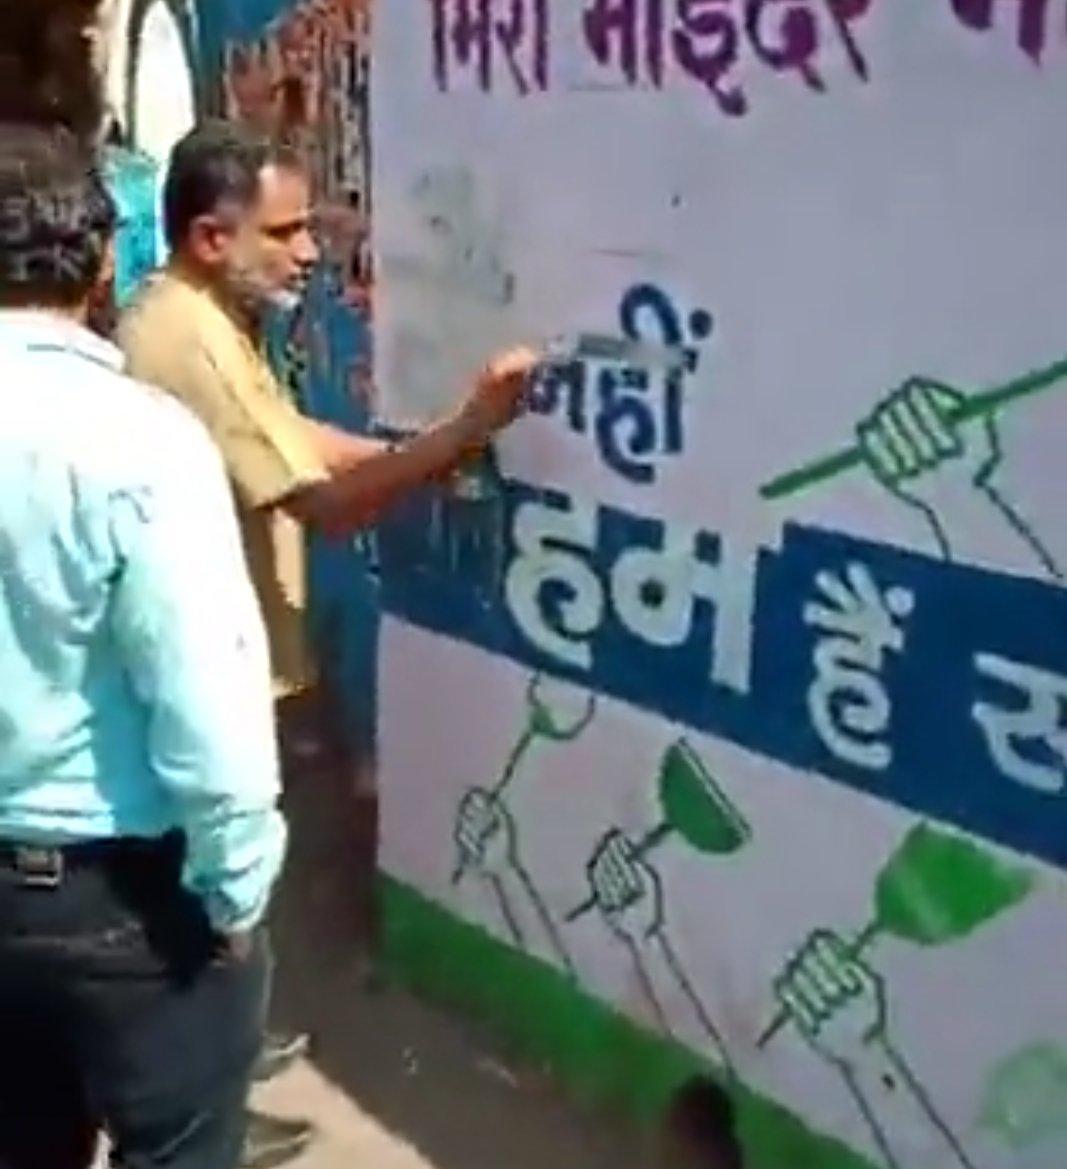 हिंदी अतिरेक झालेल्या ठिकाणी रंग लावून आम्ही महाराष्ट्रात हिंदी दिवस साजरा करतो. #महाराष्ट्रातमराठी This is how we celebrate the hindi day in Maharashtra. By replacing unwanted imposed Hindi on wall paint with state language Marathi. #StopHindilmposition #मराठीएकीकरणसमिती